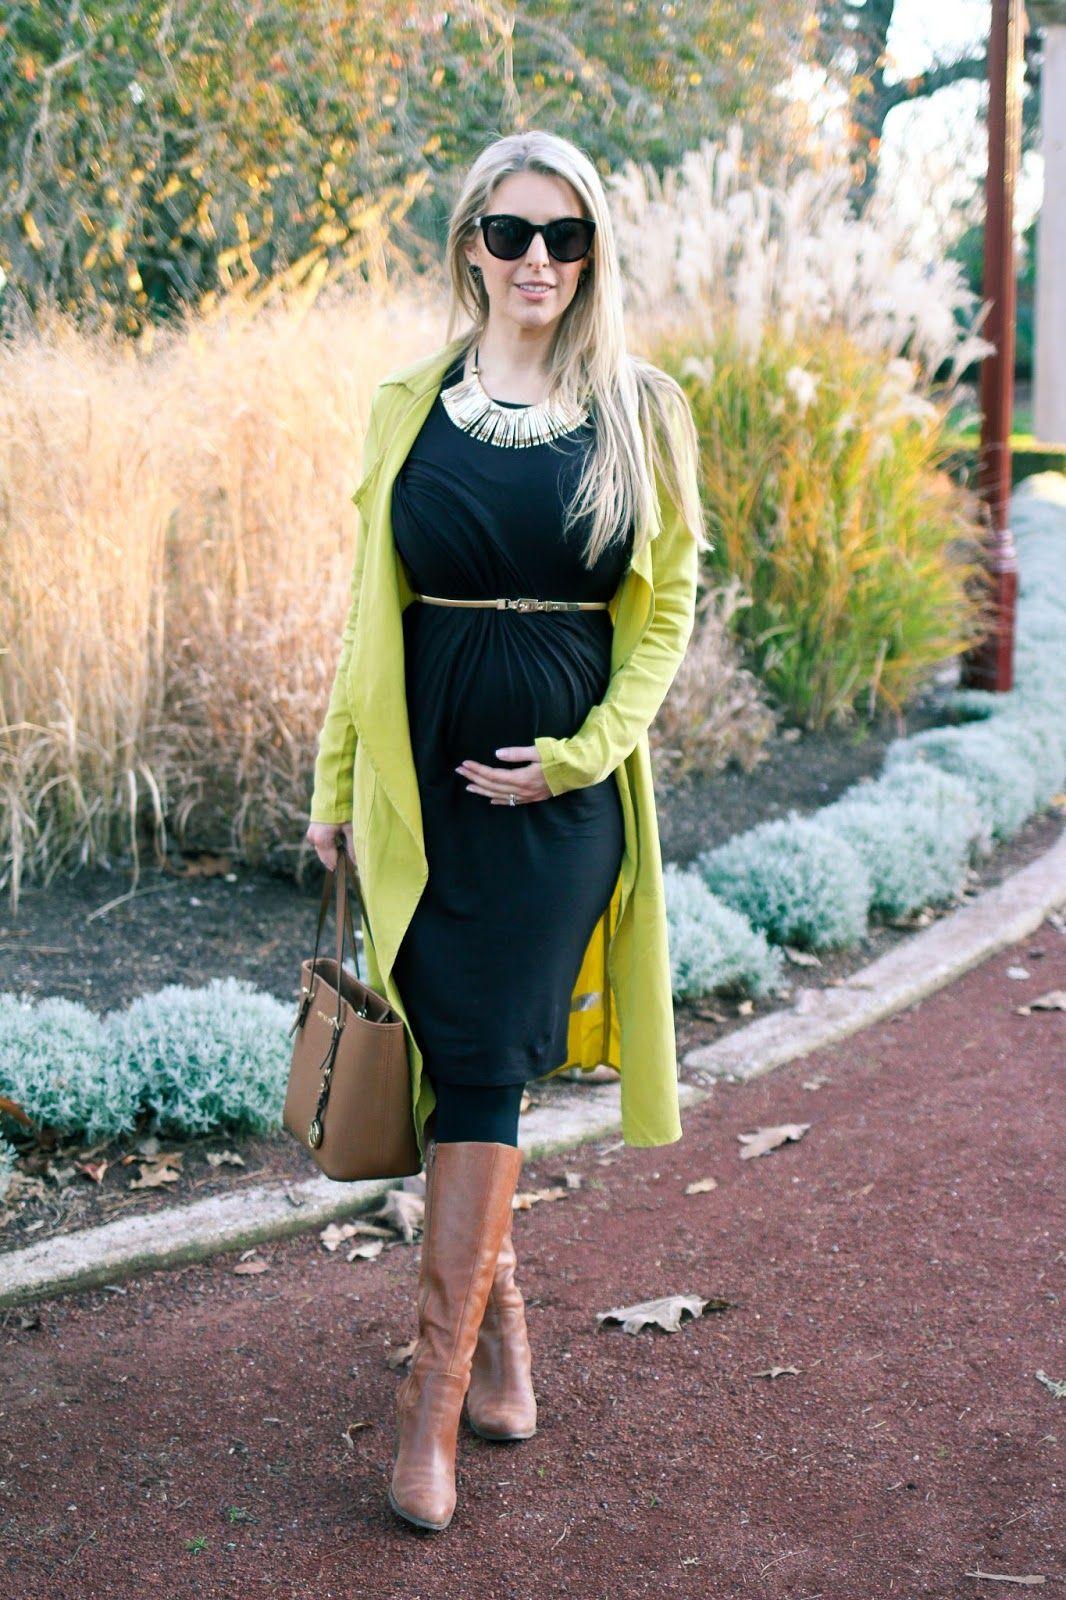 The goldfields girl styling maternity fashion she wears black